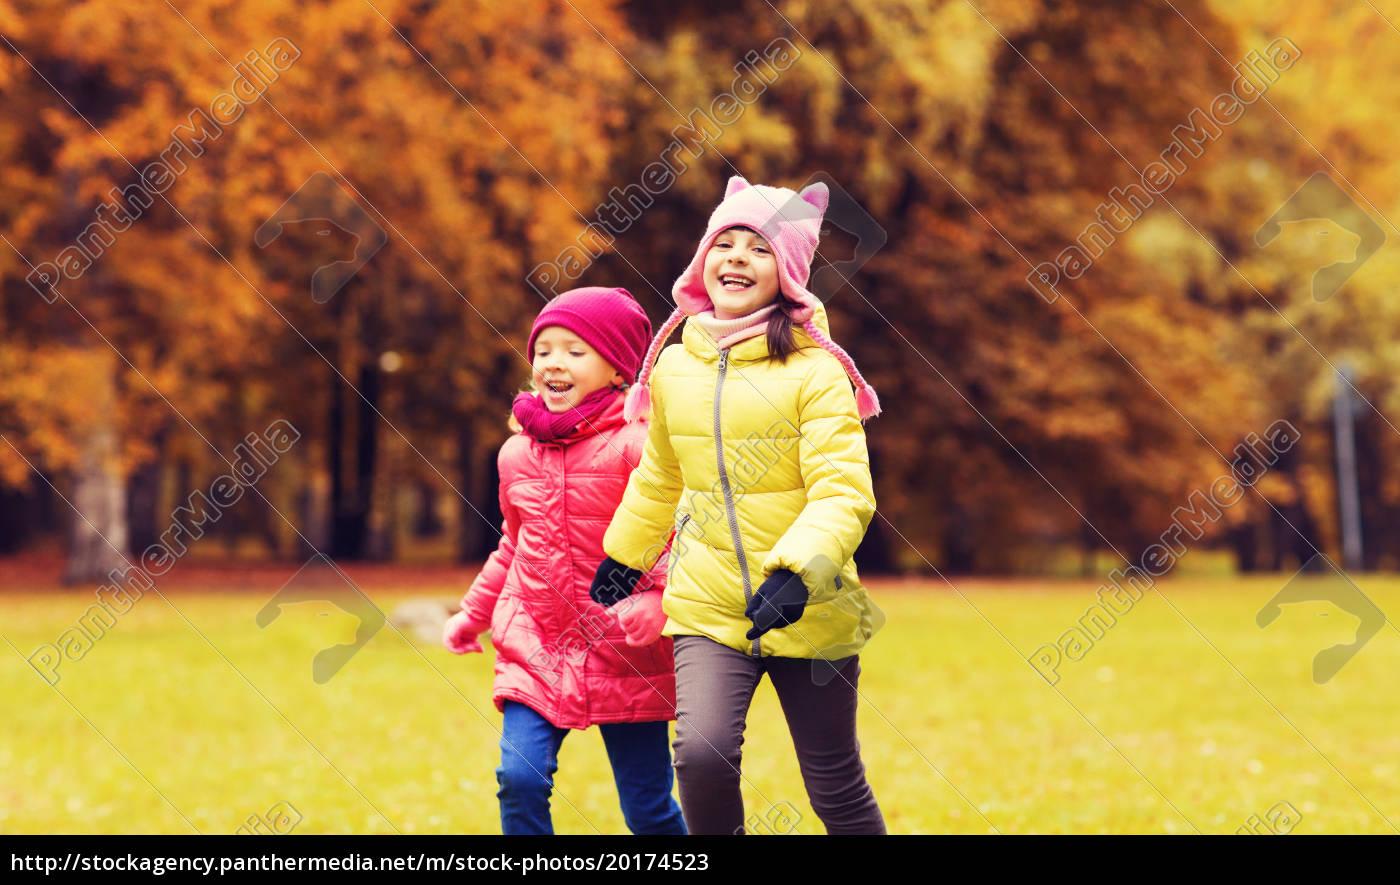 group, of, happy, little, girls, running - 20174523